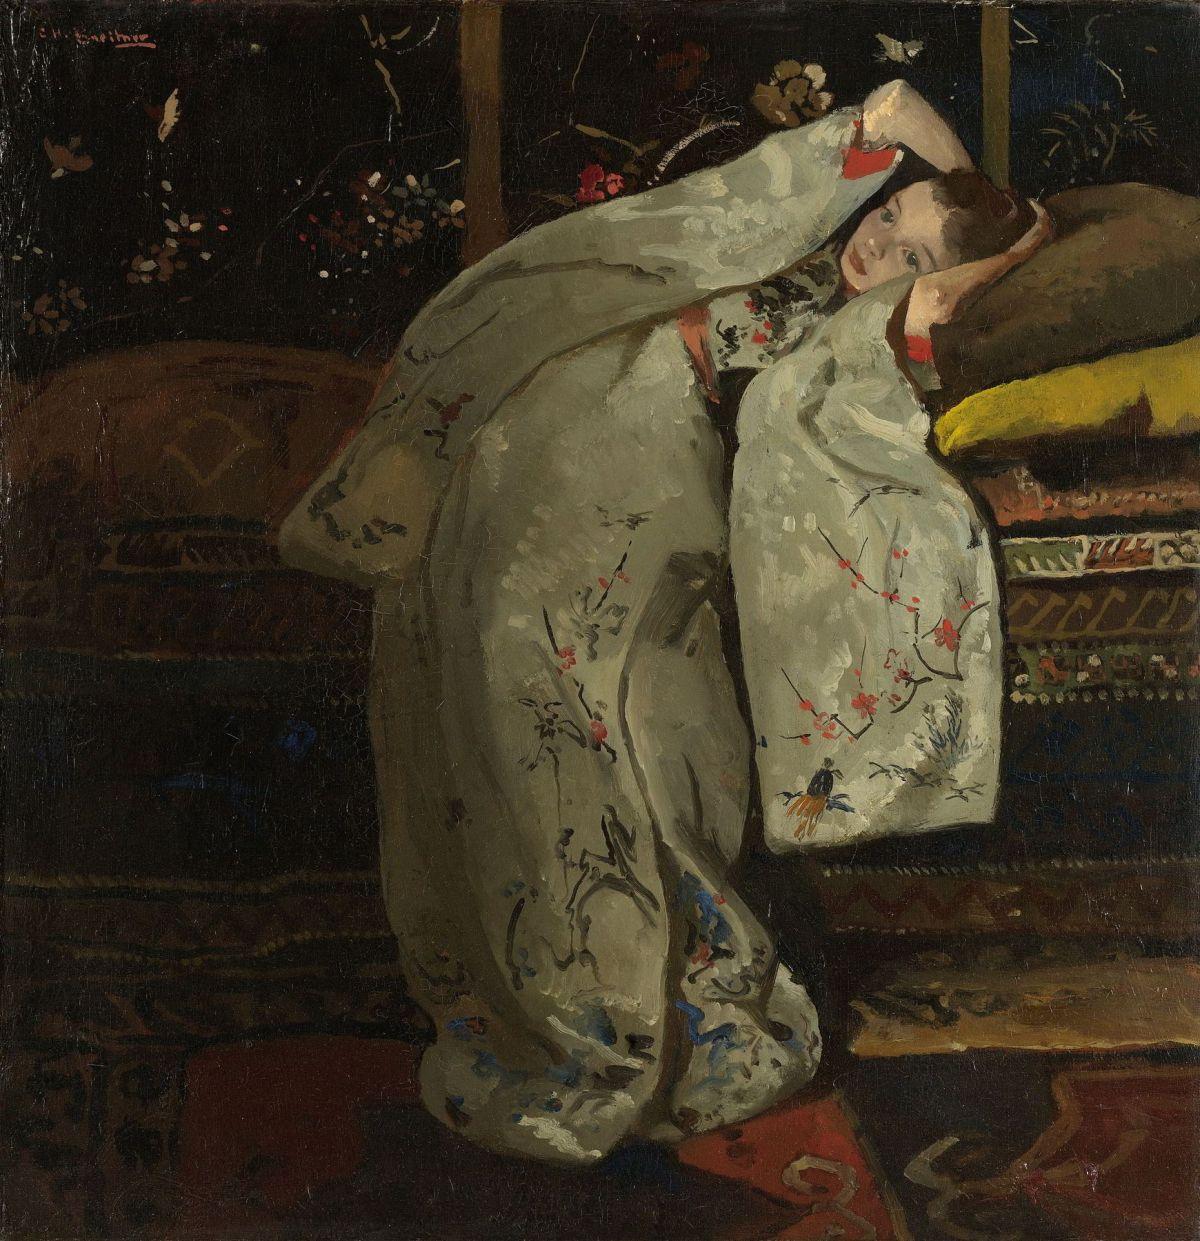 Girl in a White Kimono by George Hendrik Breitner